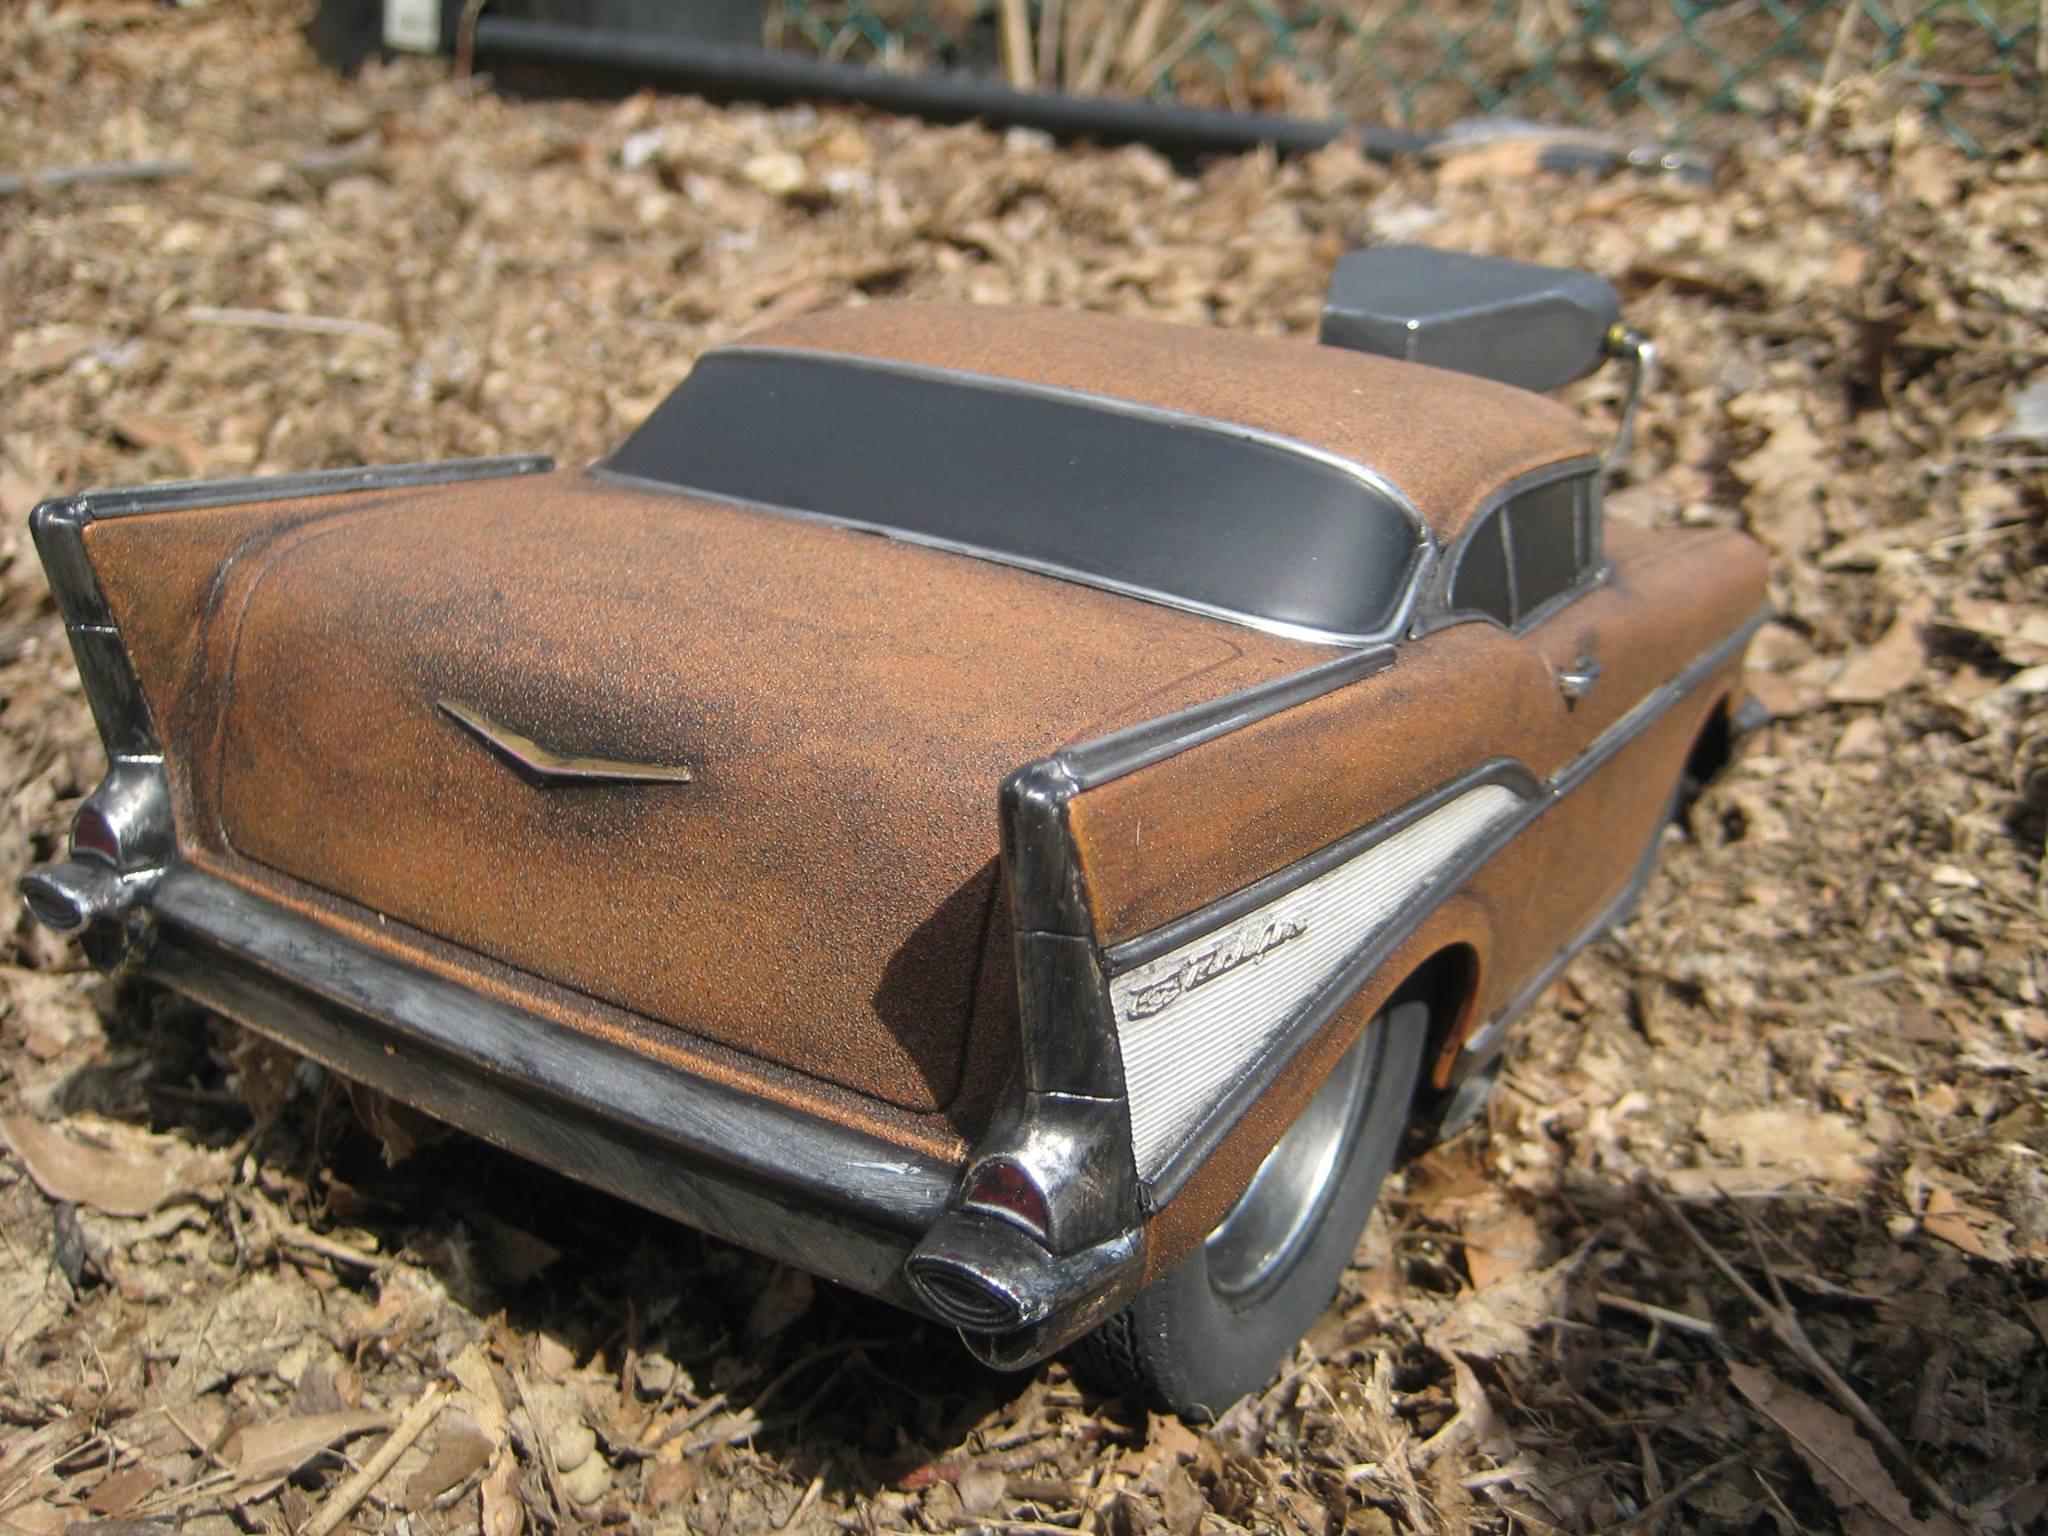 Chevy-3